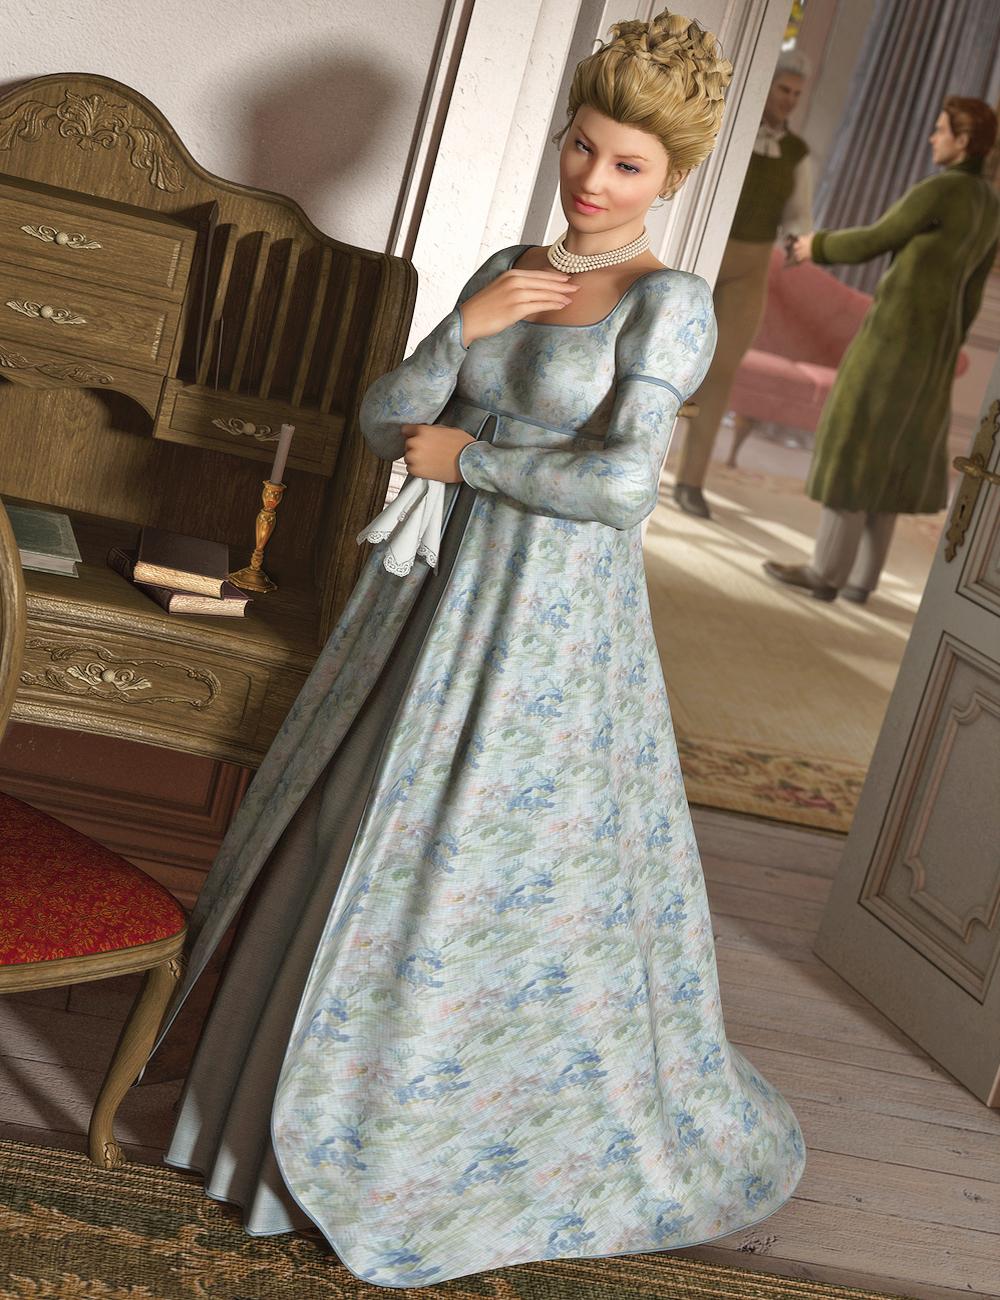 Sensibility for Genesis 2 Female(s) by: Ravenhair, 3D Models by Daz 3D